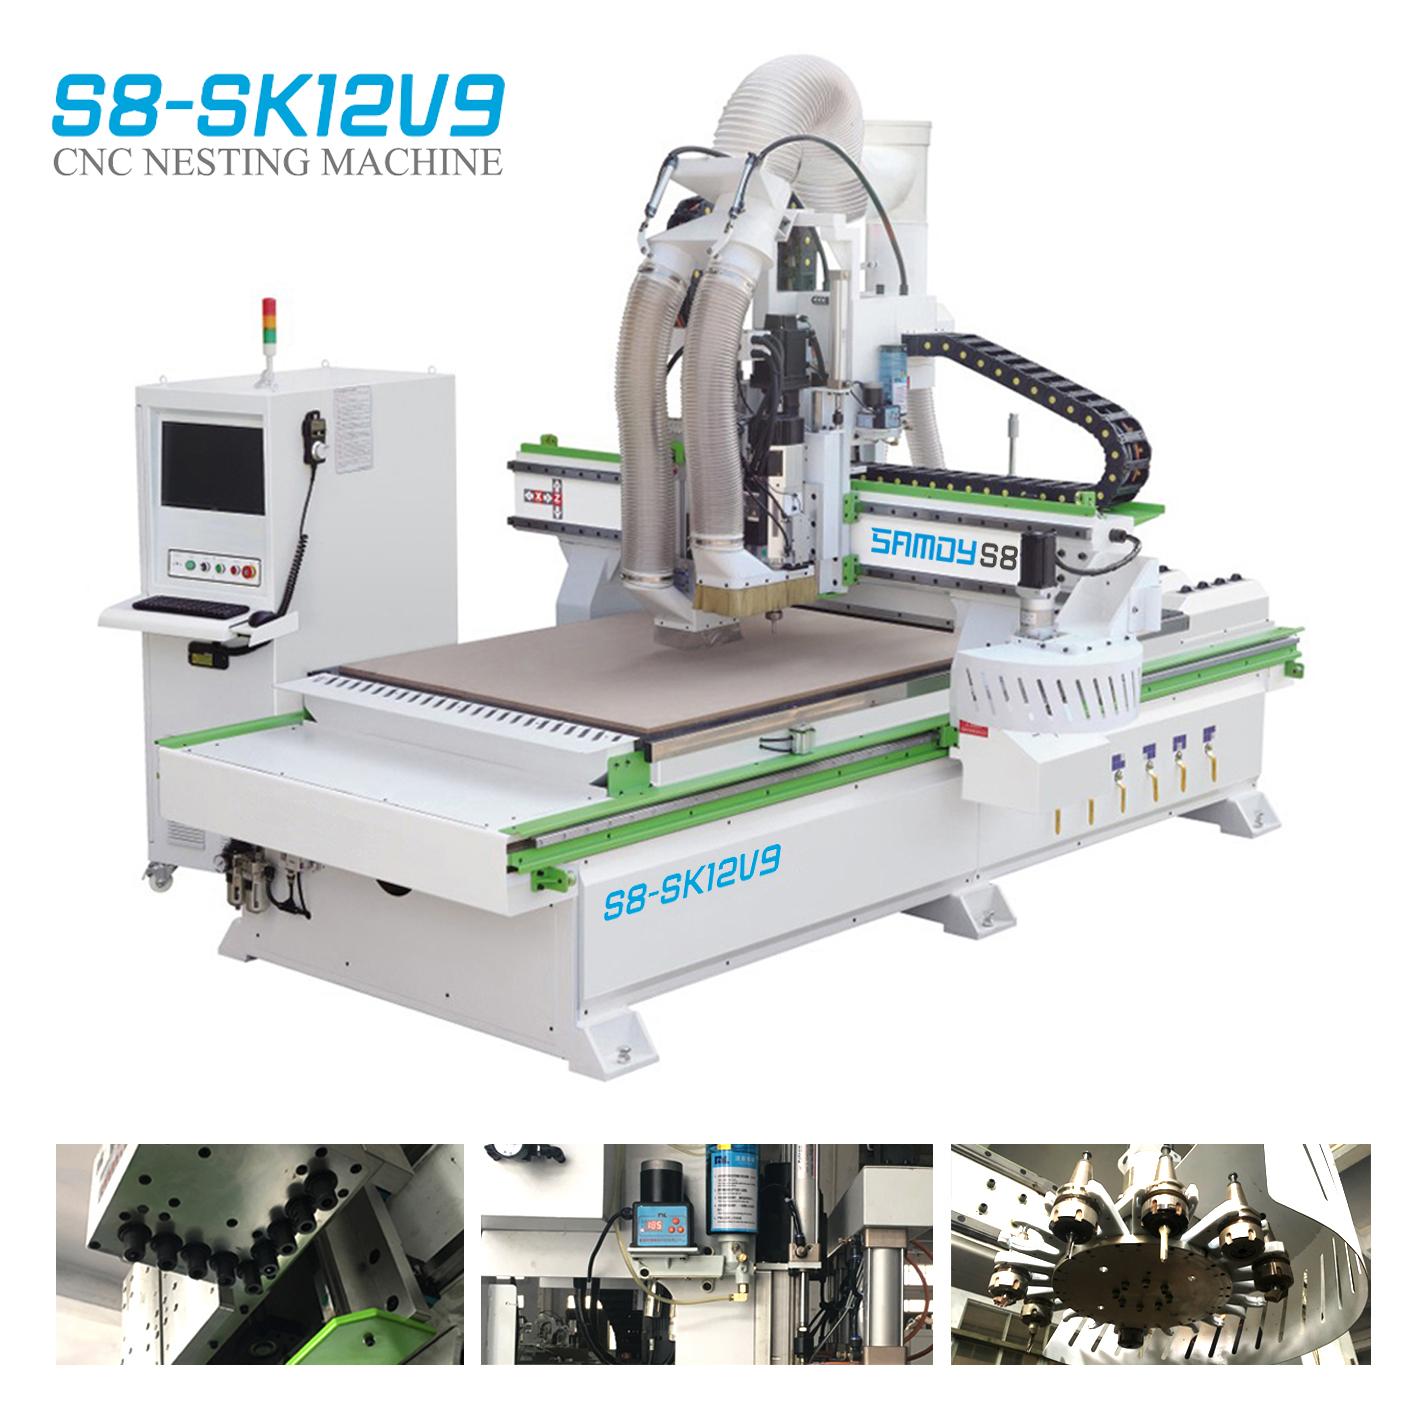 CNC Nesting S8 - SK12V9